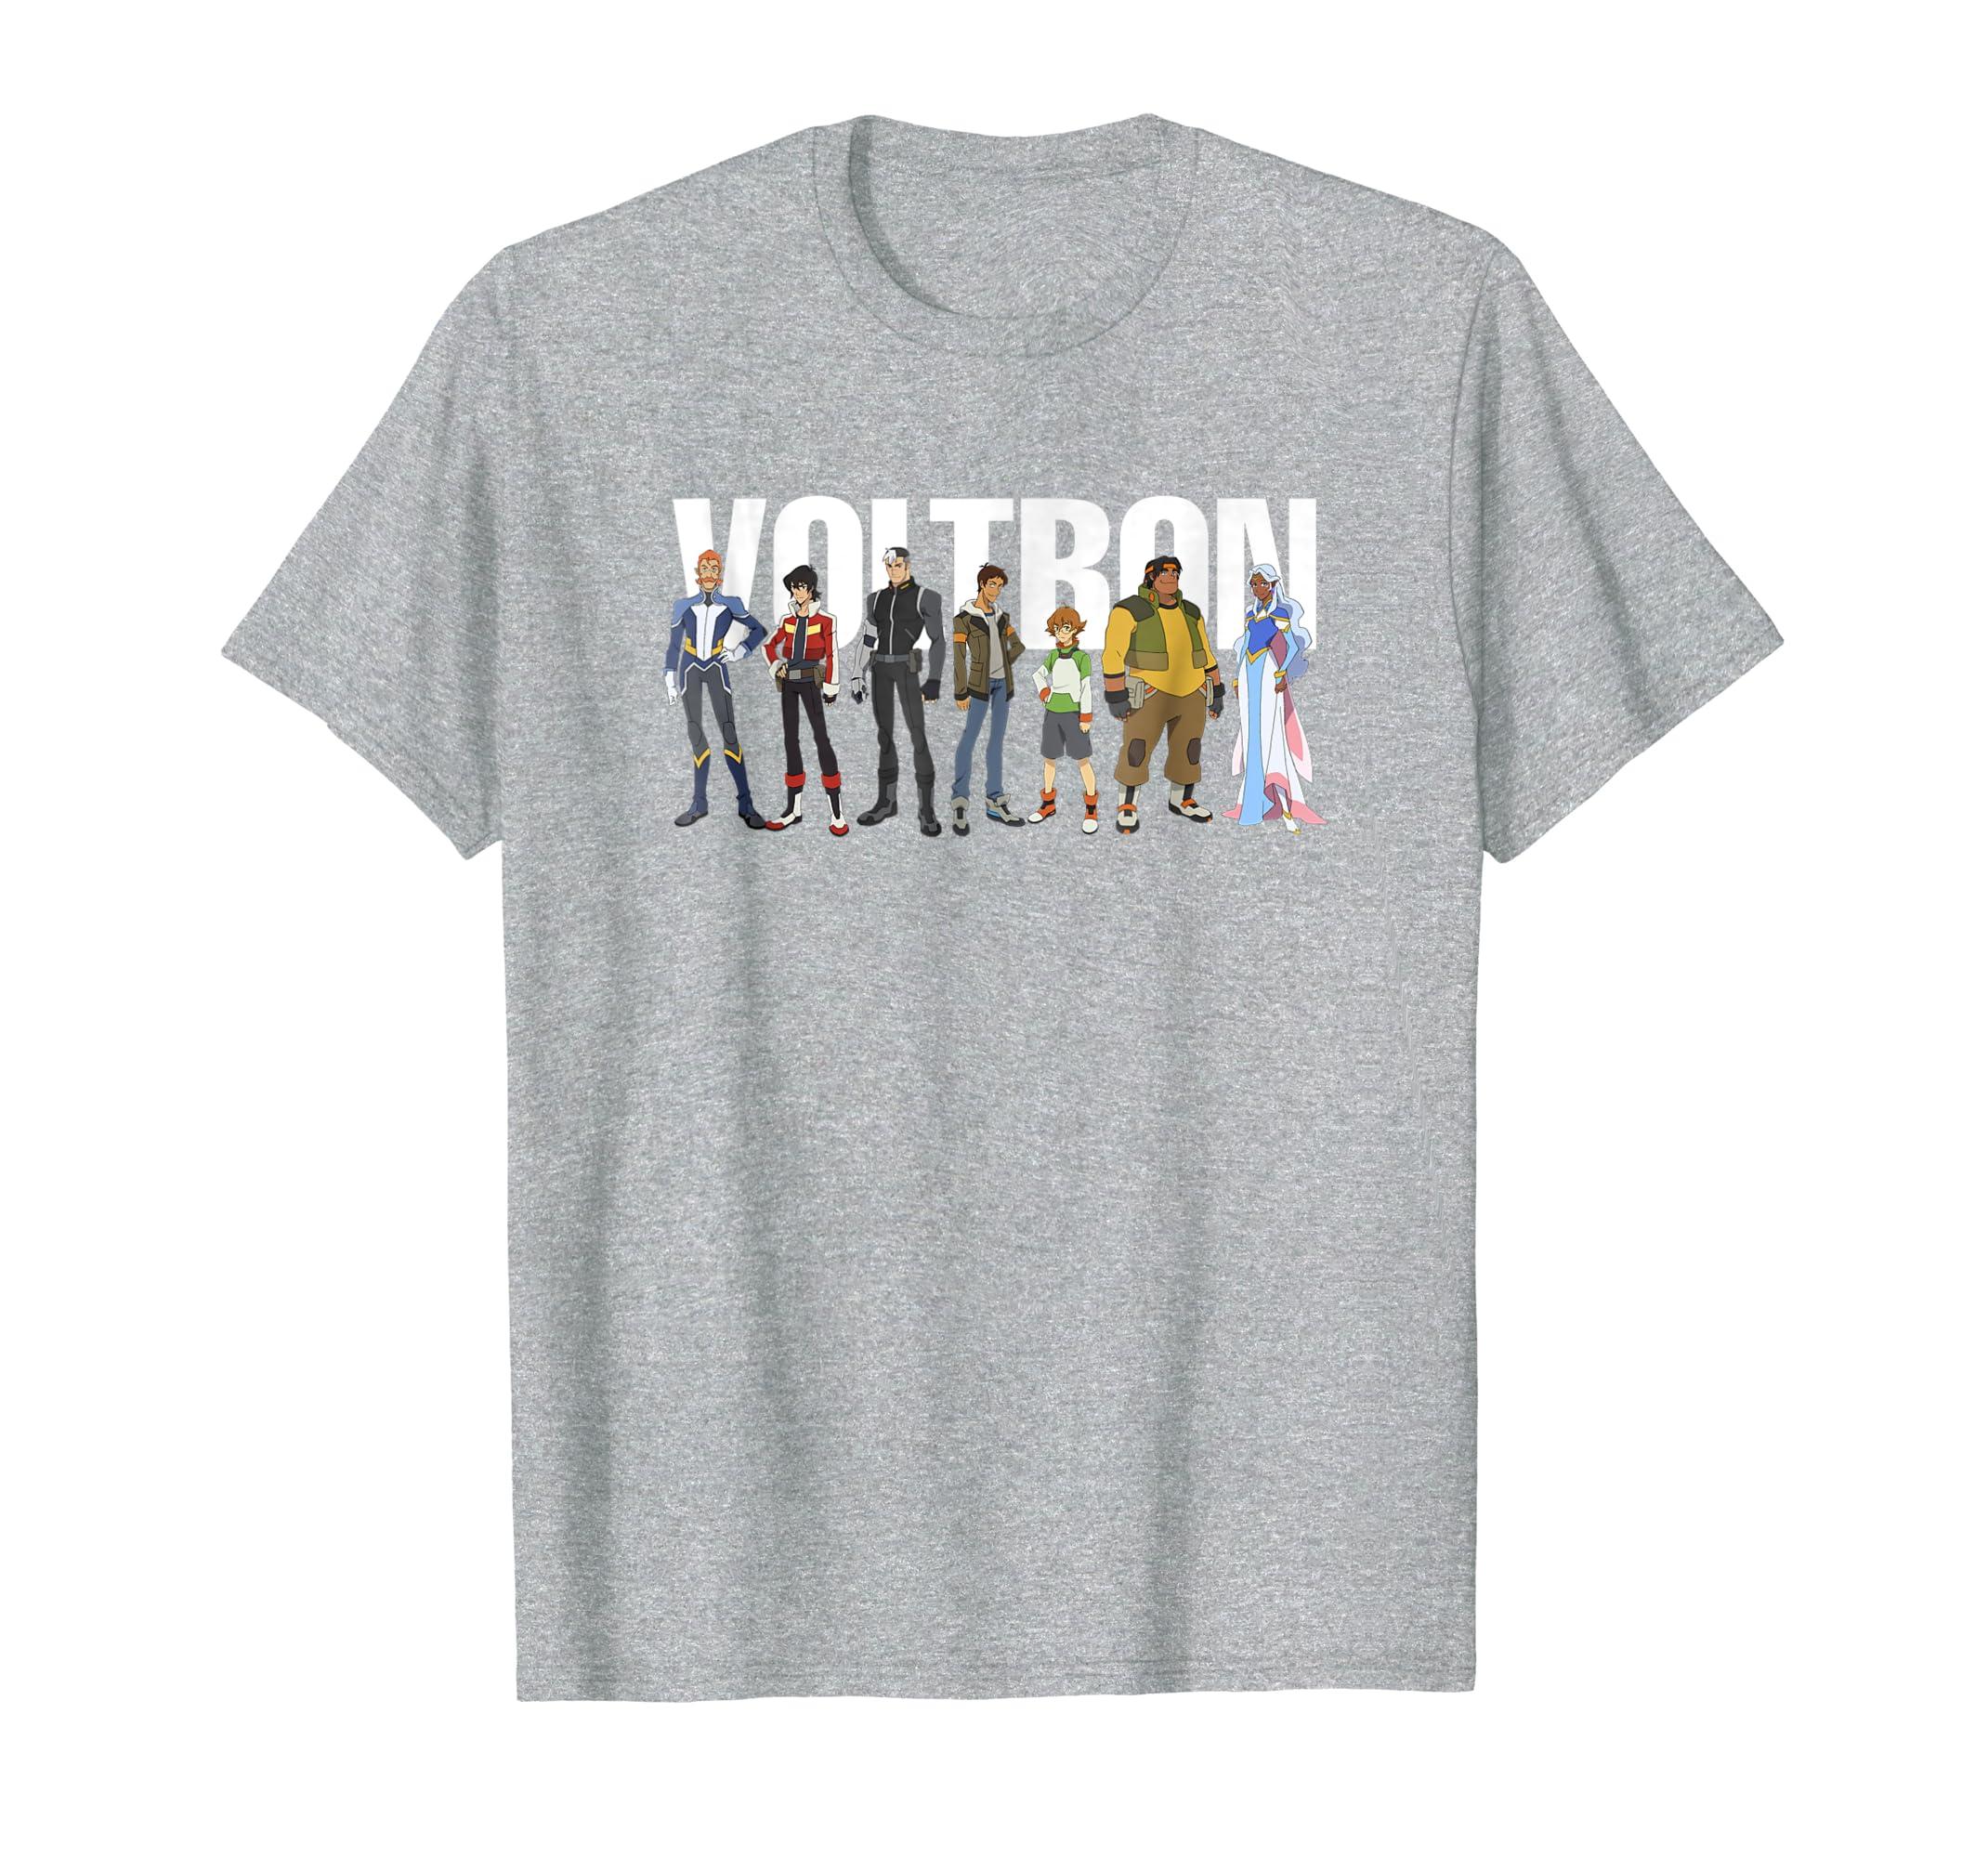 c4515c8d Amazon.com: DreamWorks - Voltron Full Team T-Shirt: Clothing